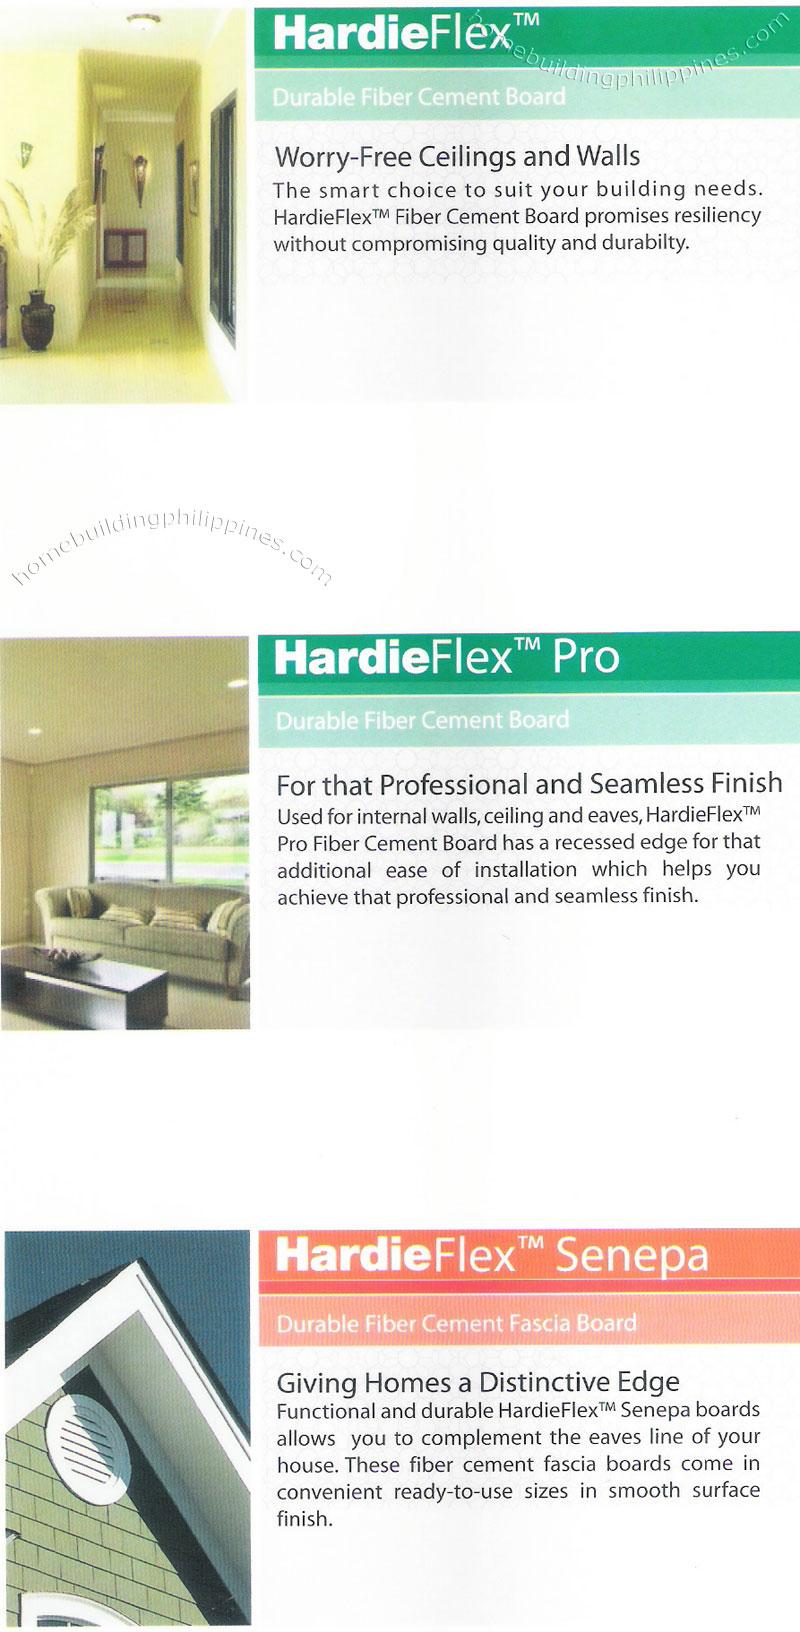 Hardieflex Hardiflex Pro Hardieflex Senepa Philippines